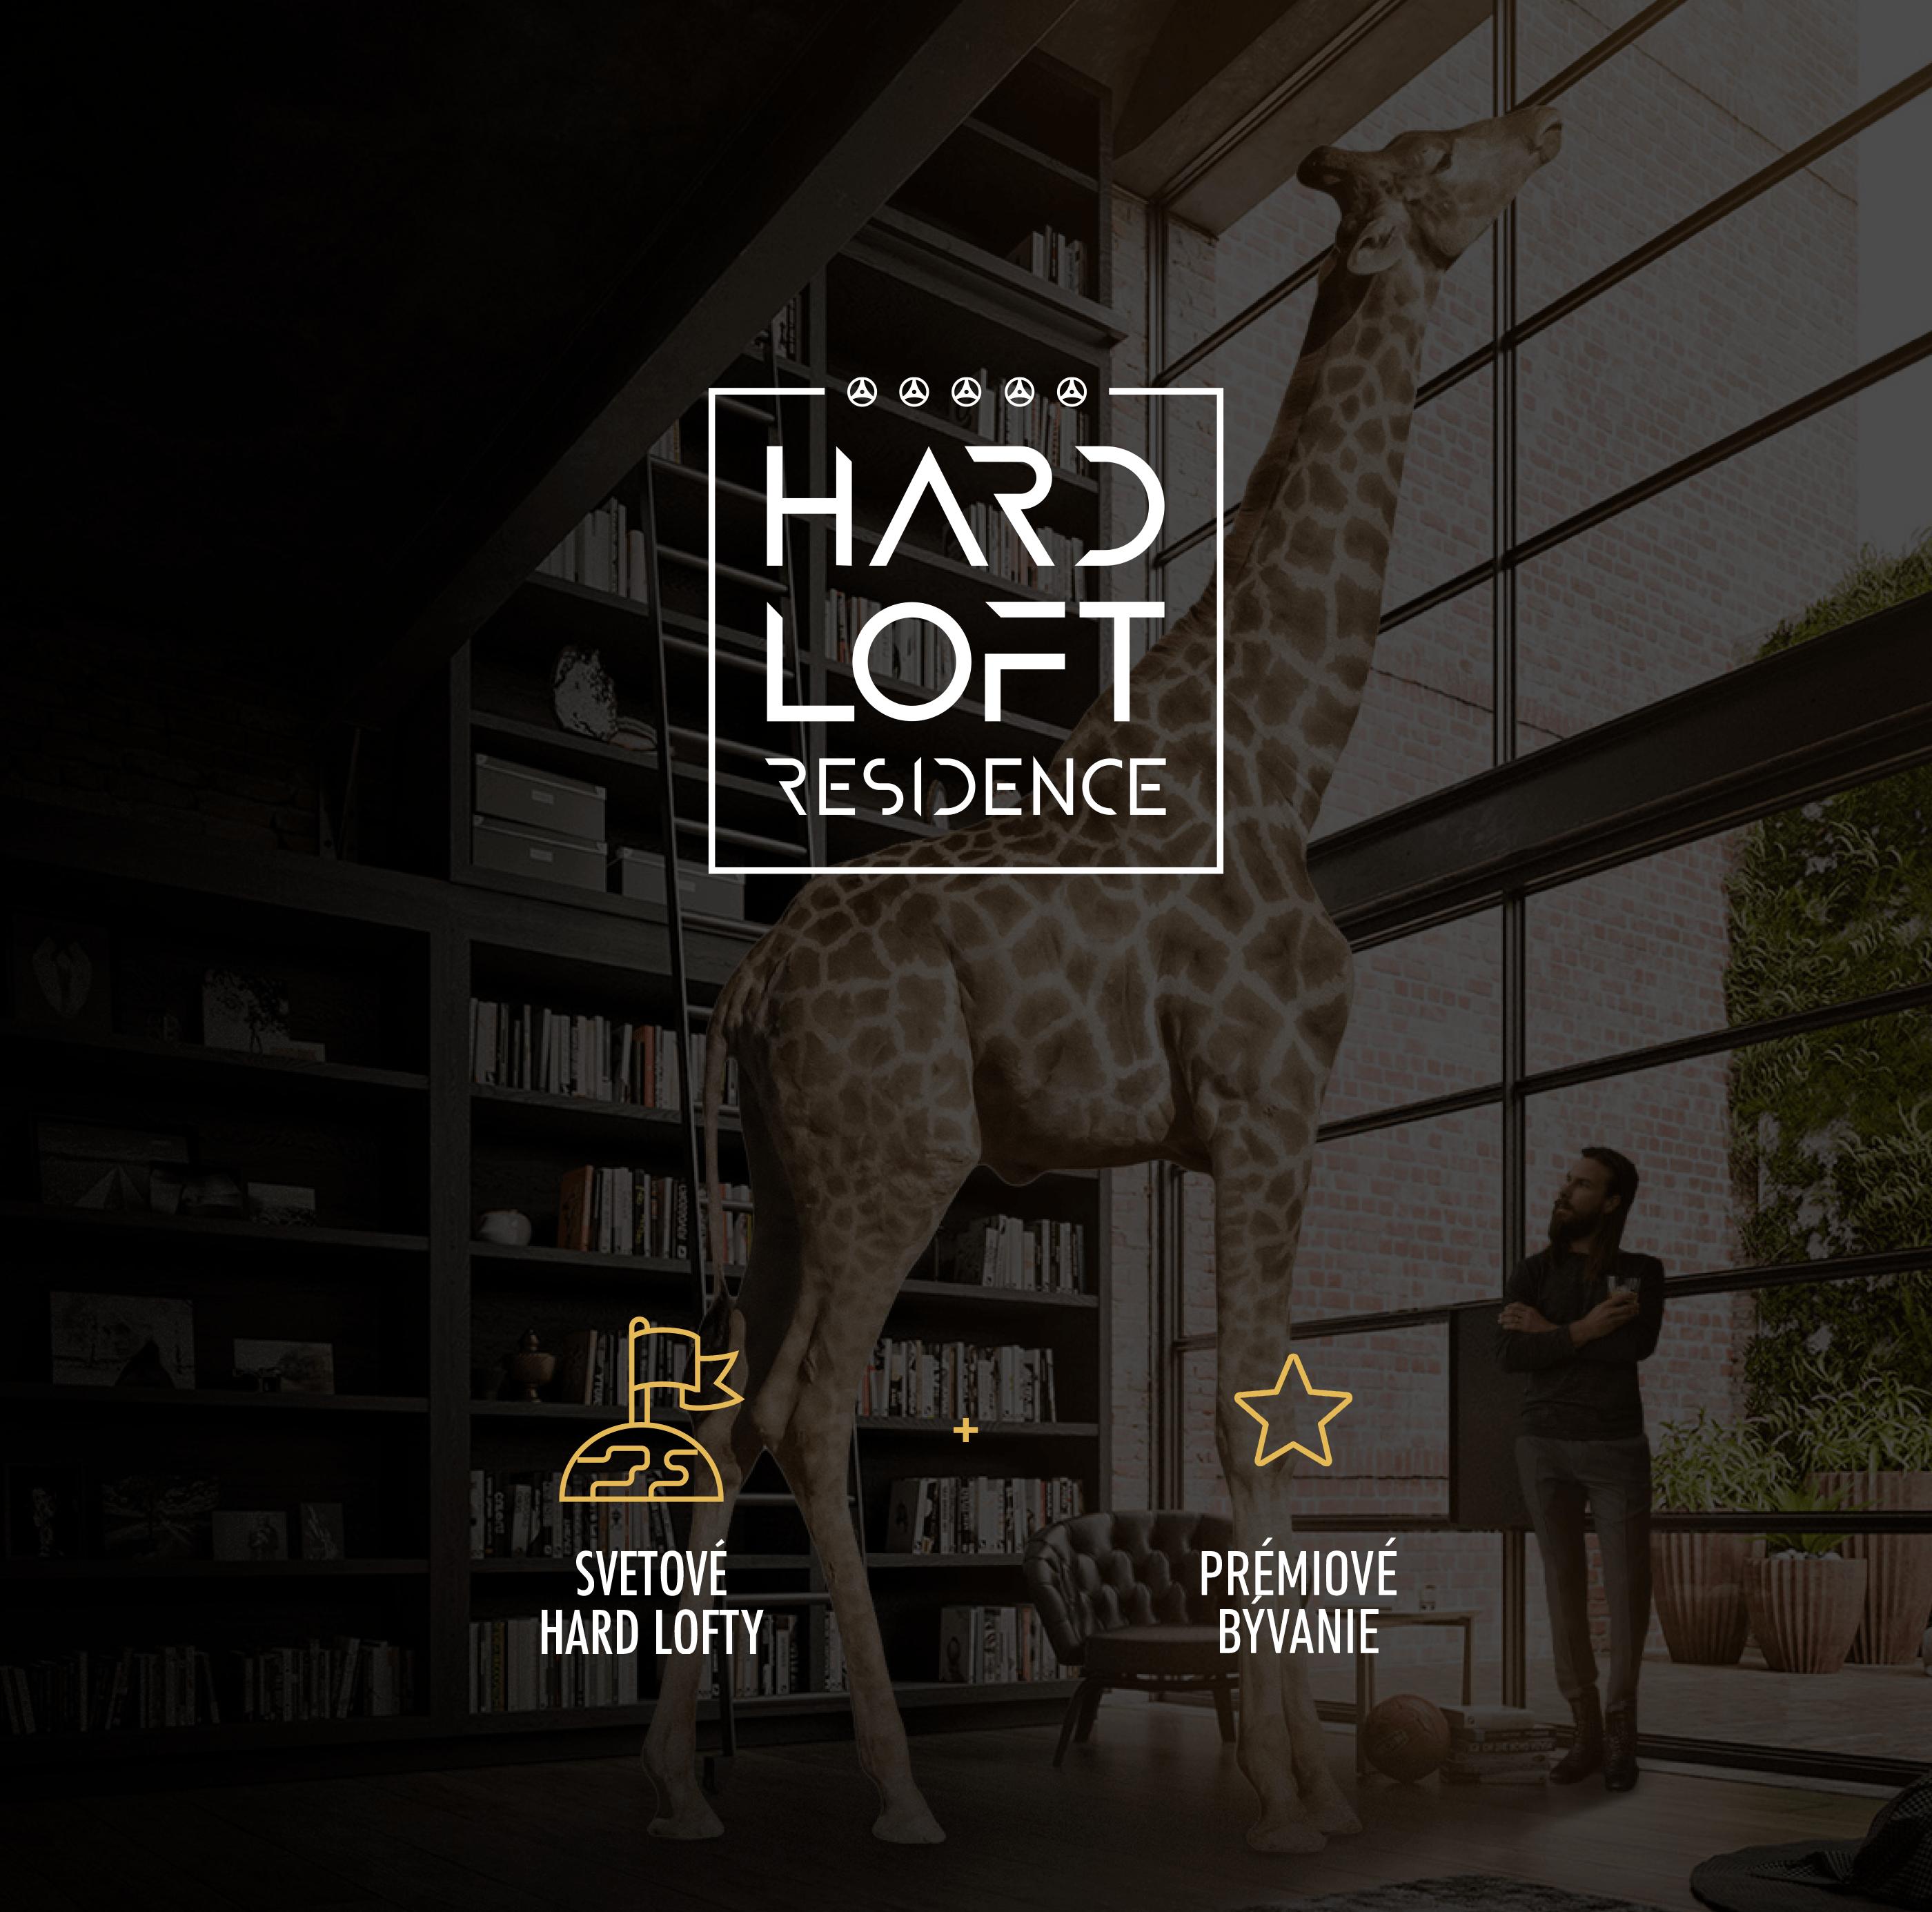 Hard Loft Residence